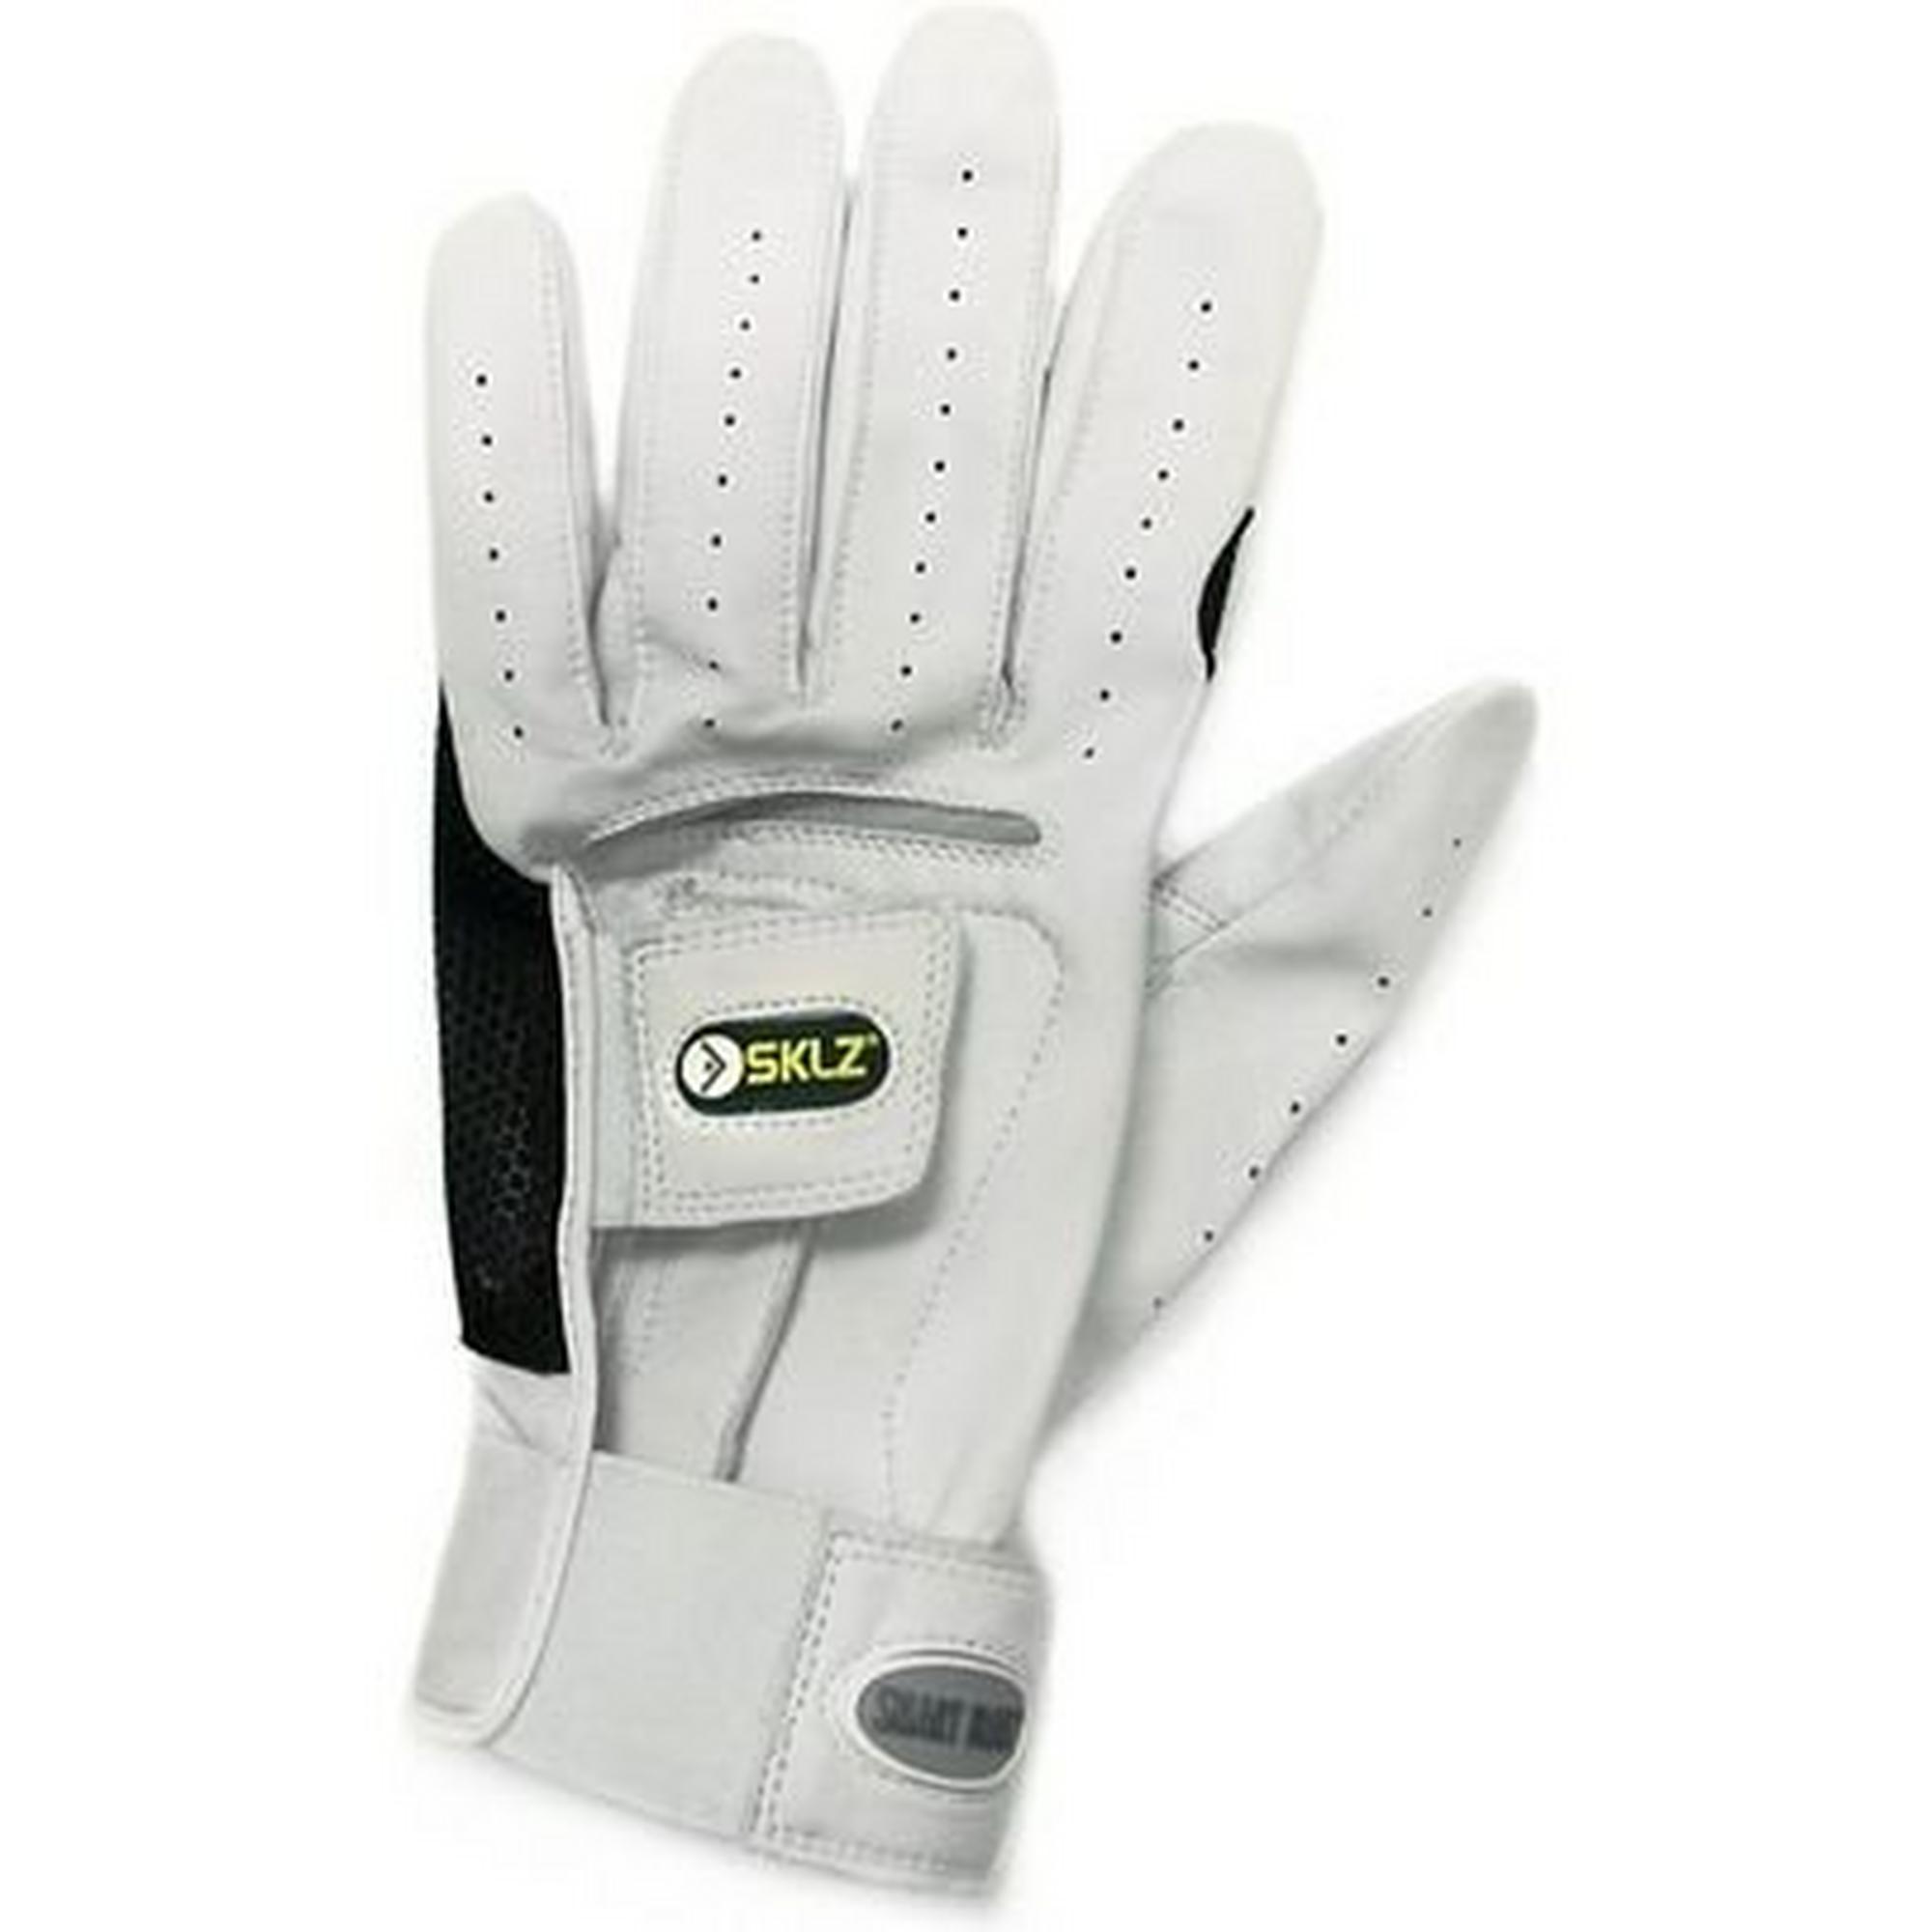 Smart Glove - Right Hand